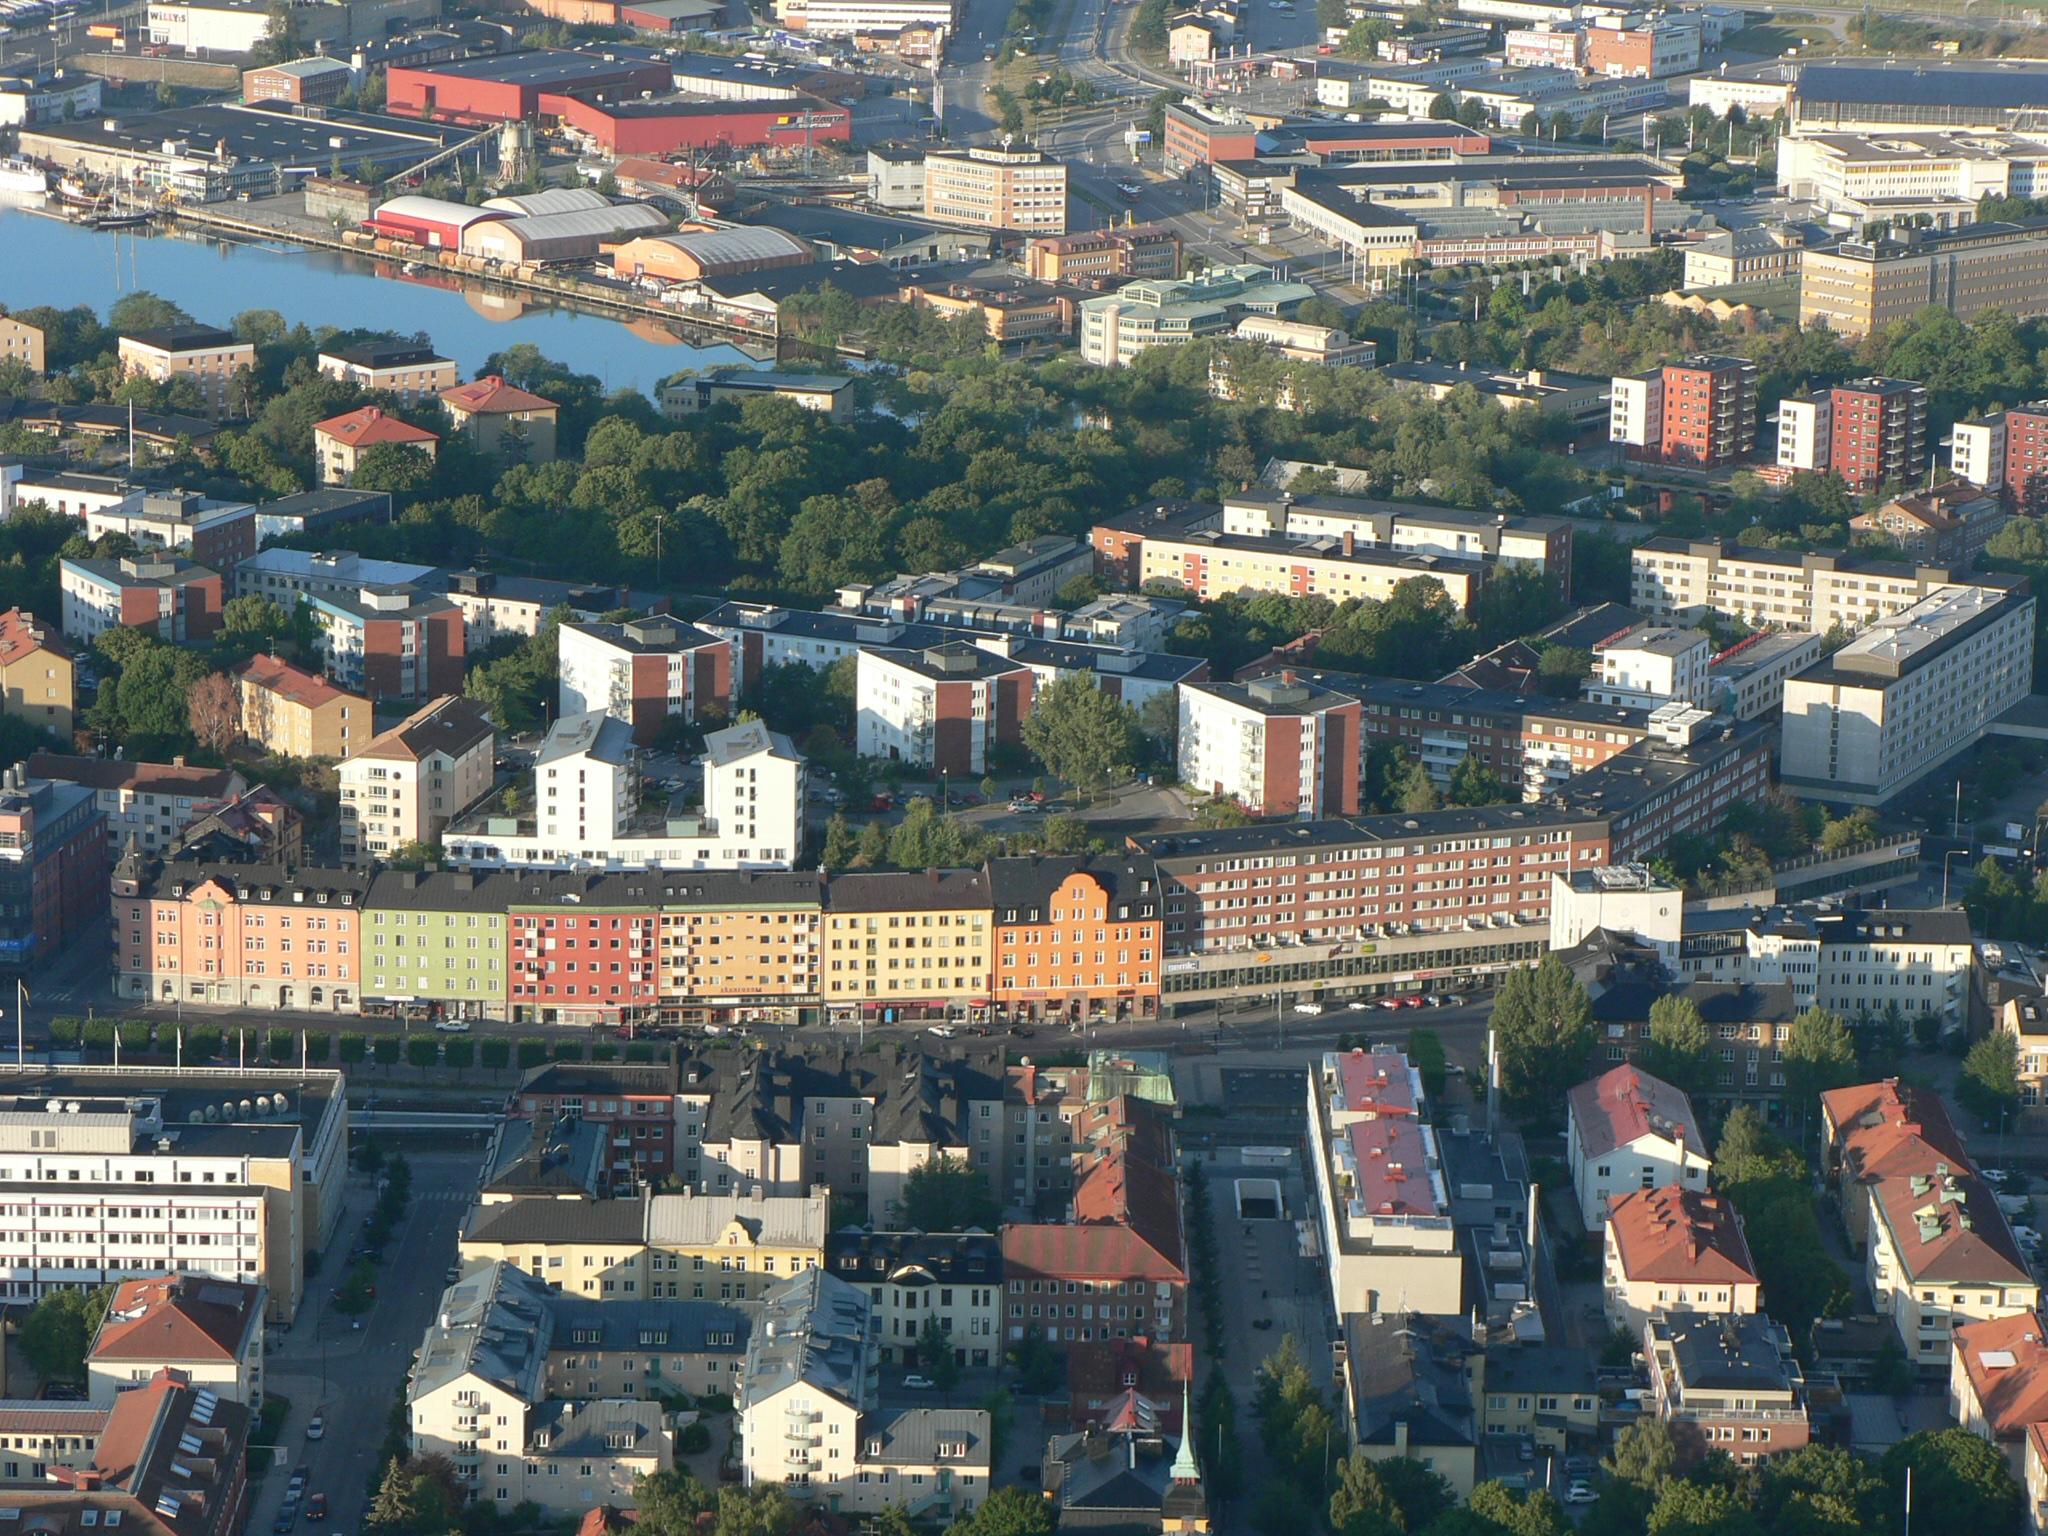 kort sexmassage vattensporter nära Stockholm